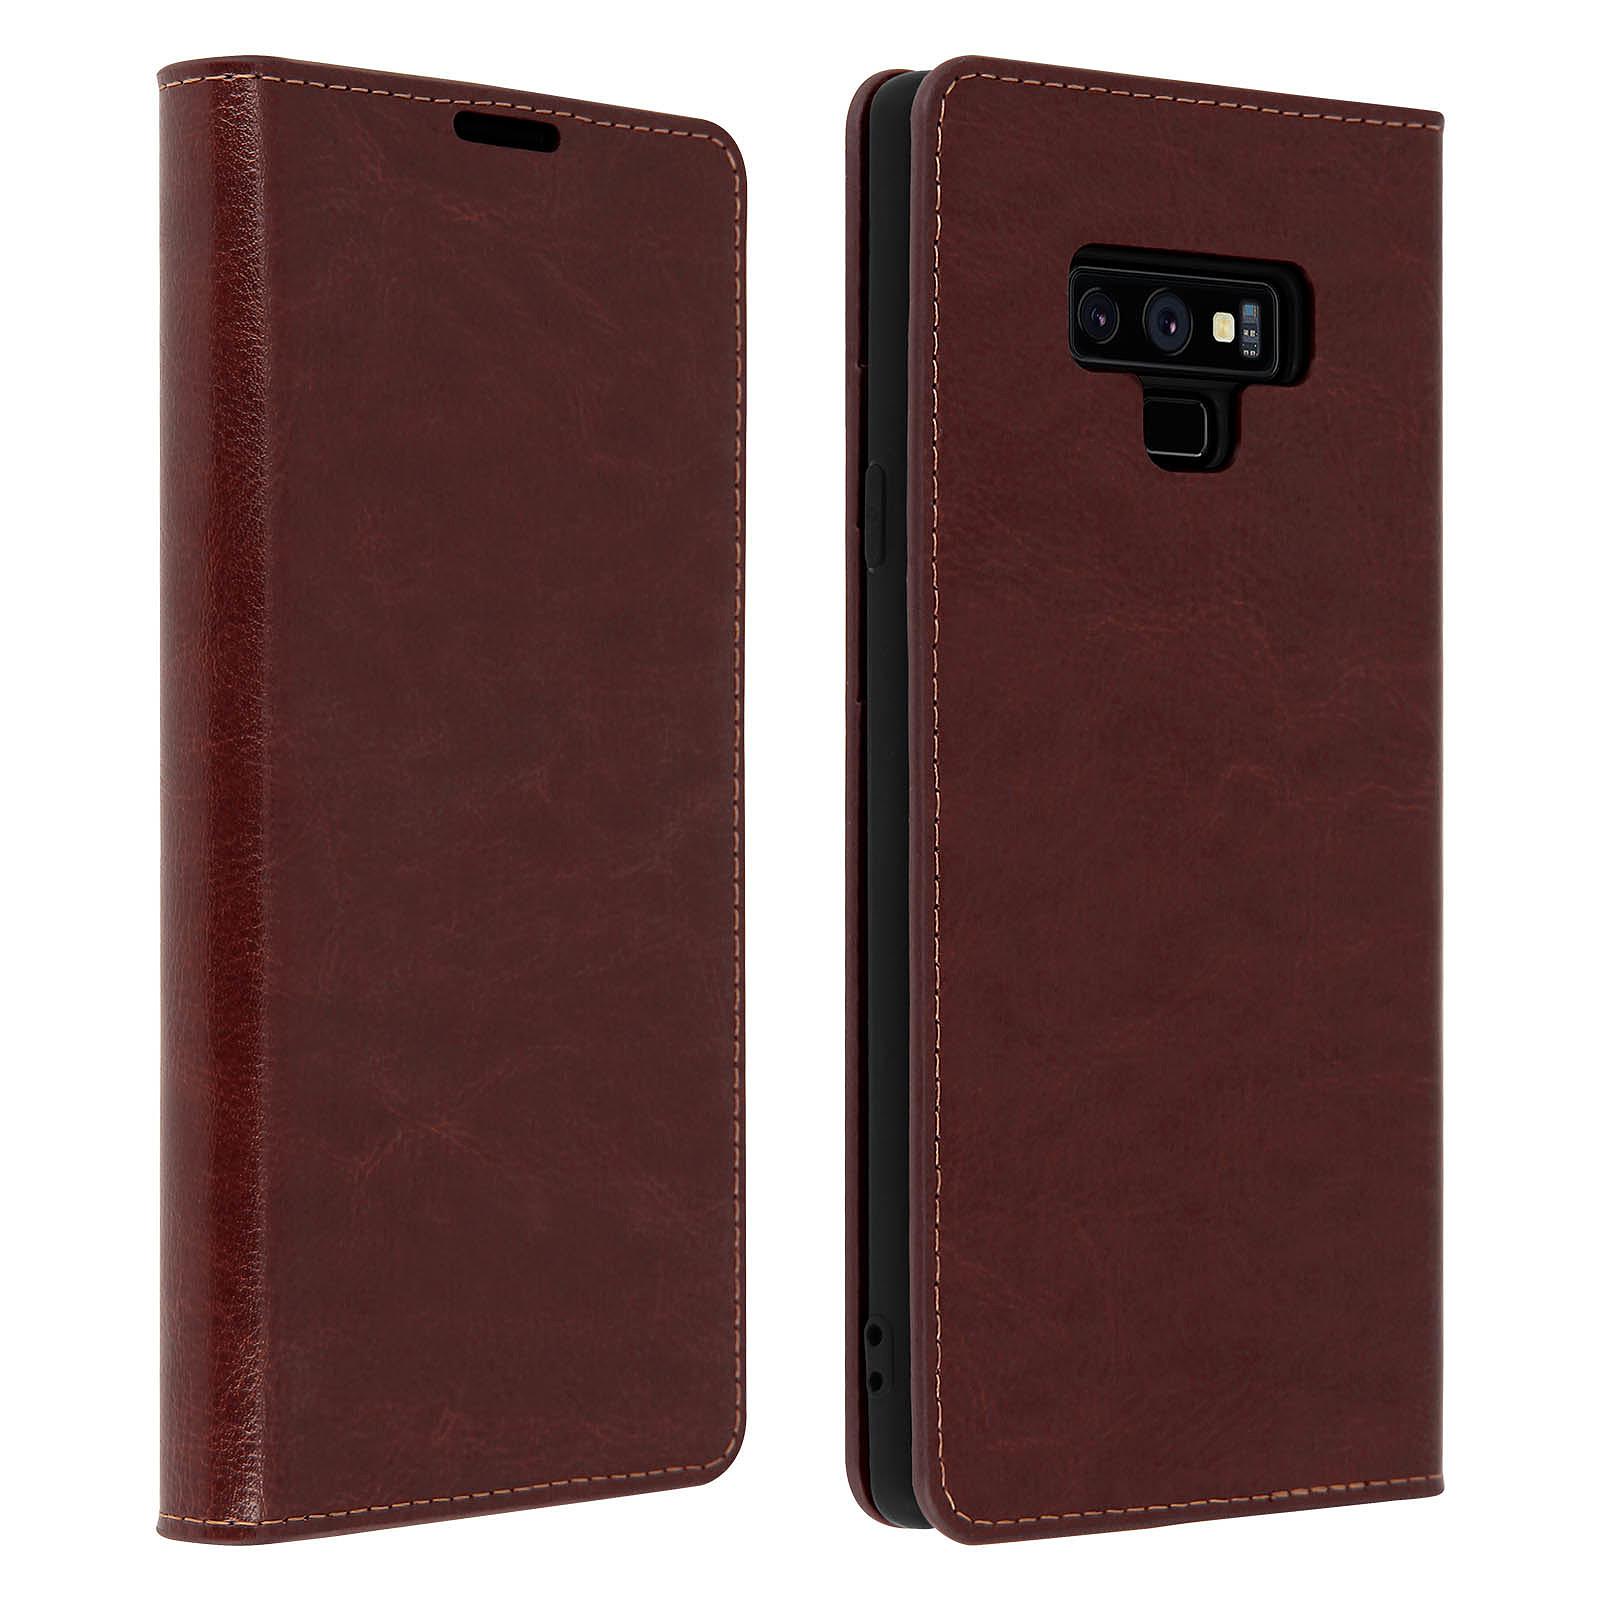 Avizar Etui folio Marron pour Samsung Galaxy Note 9